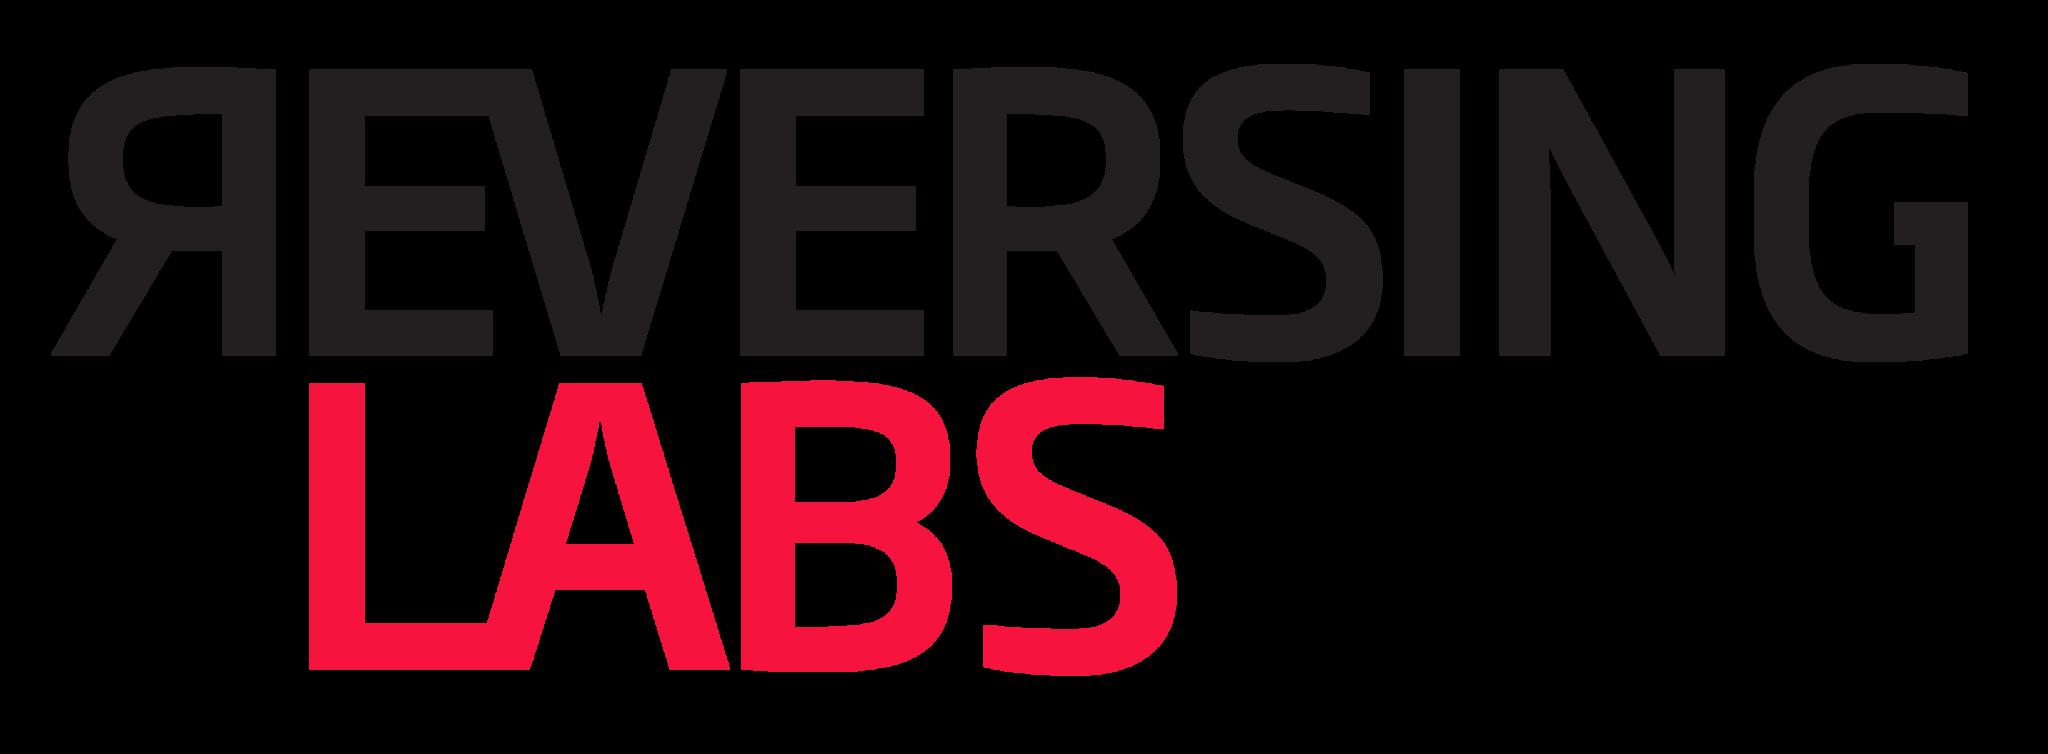 reversing-labs.png